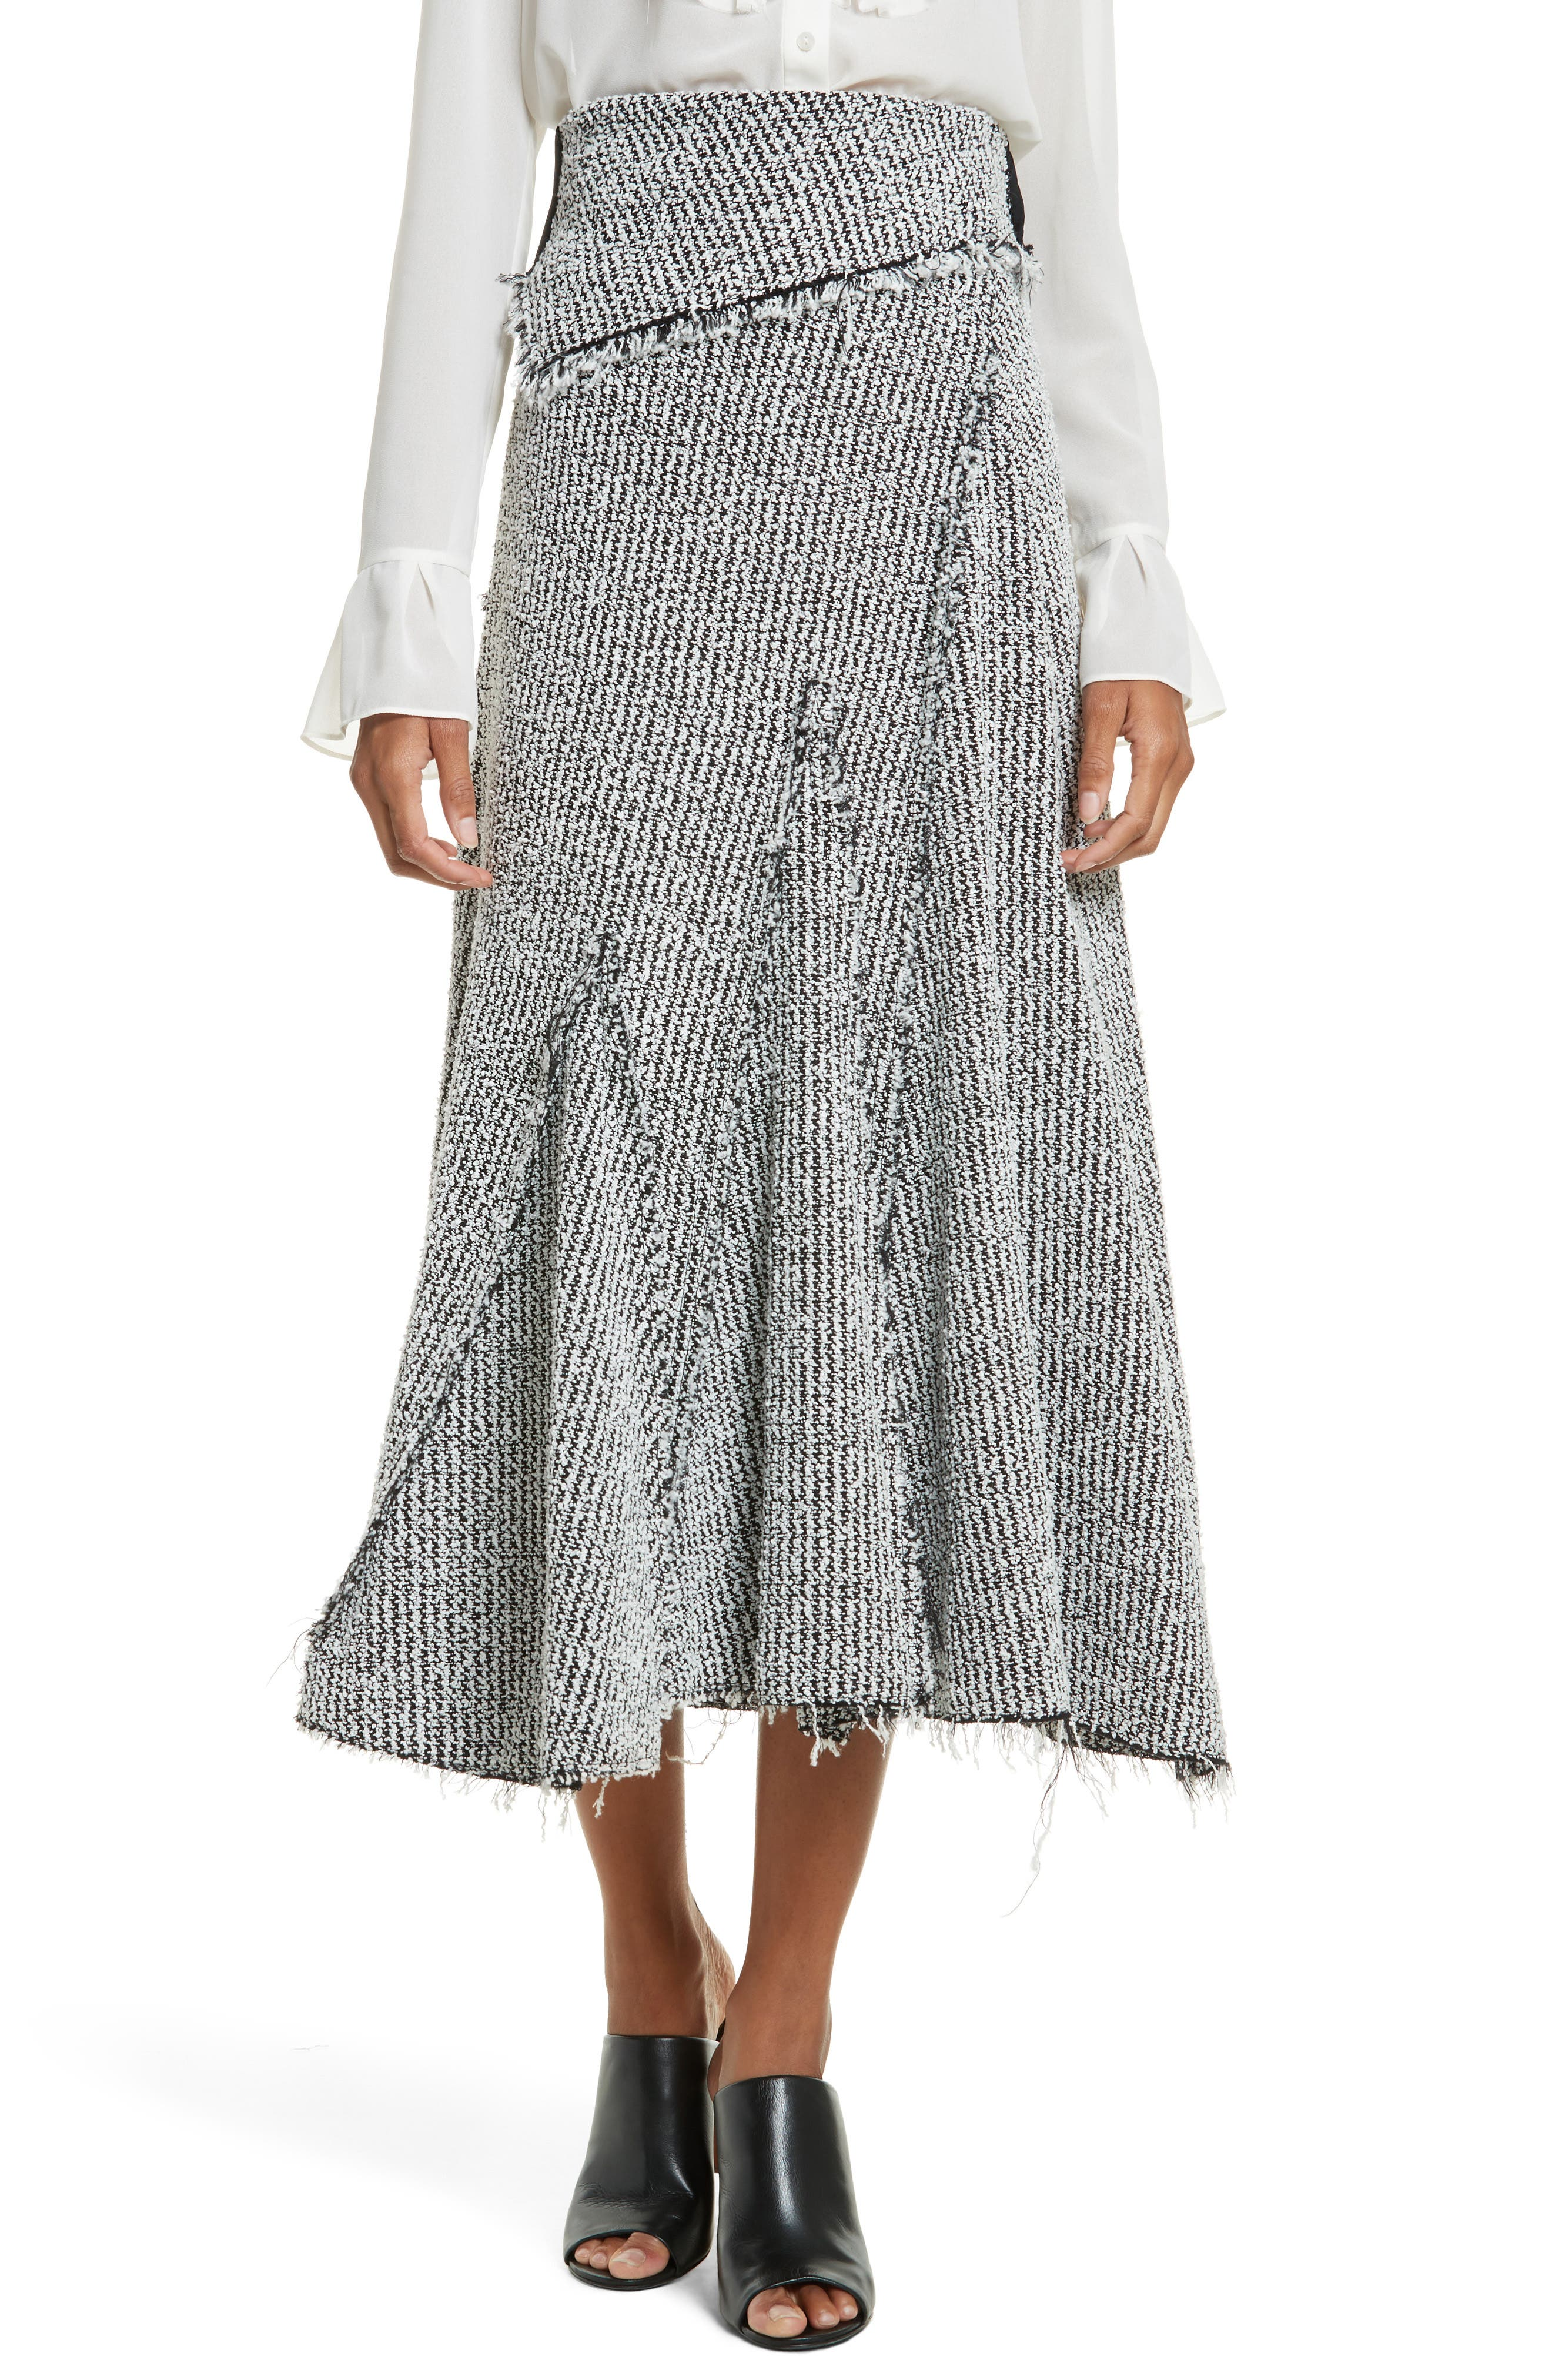 3.1 Phillip Lim Draped Midi Skirt